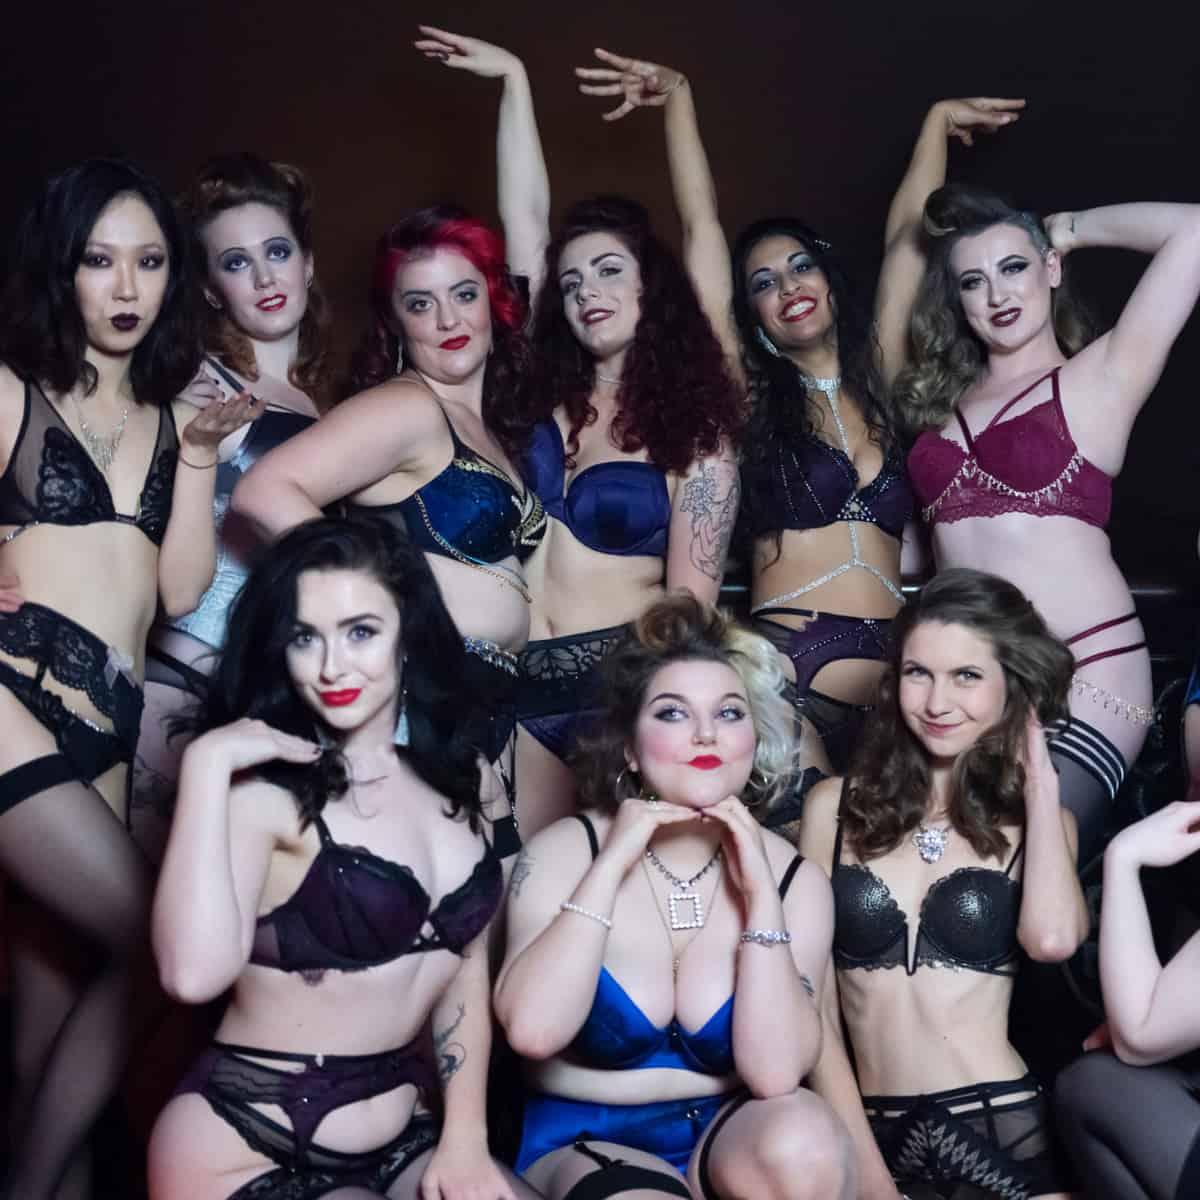 The Temptress - Burlesque Hen Party